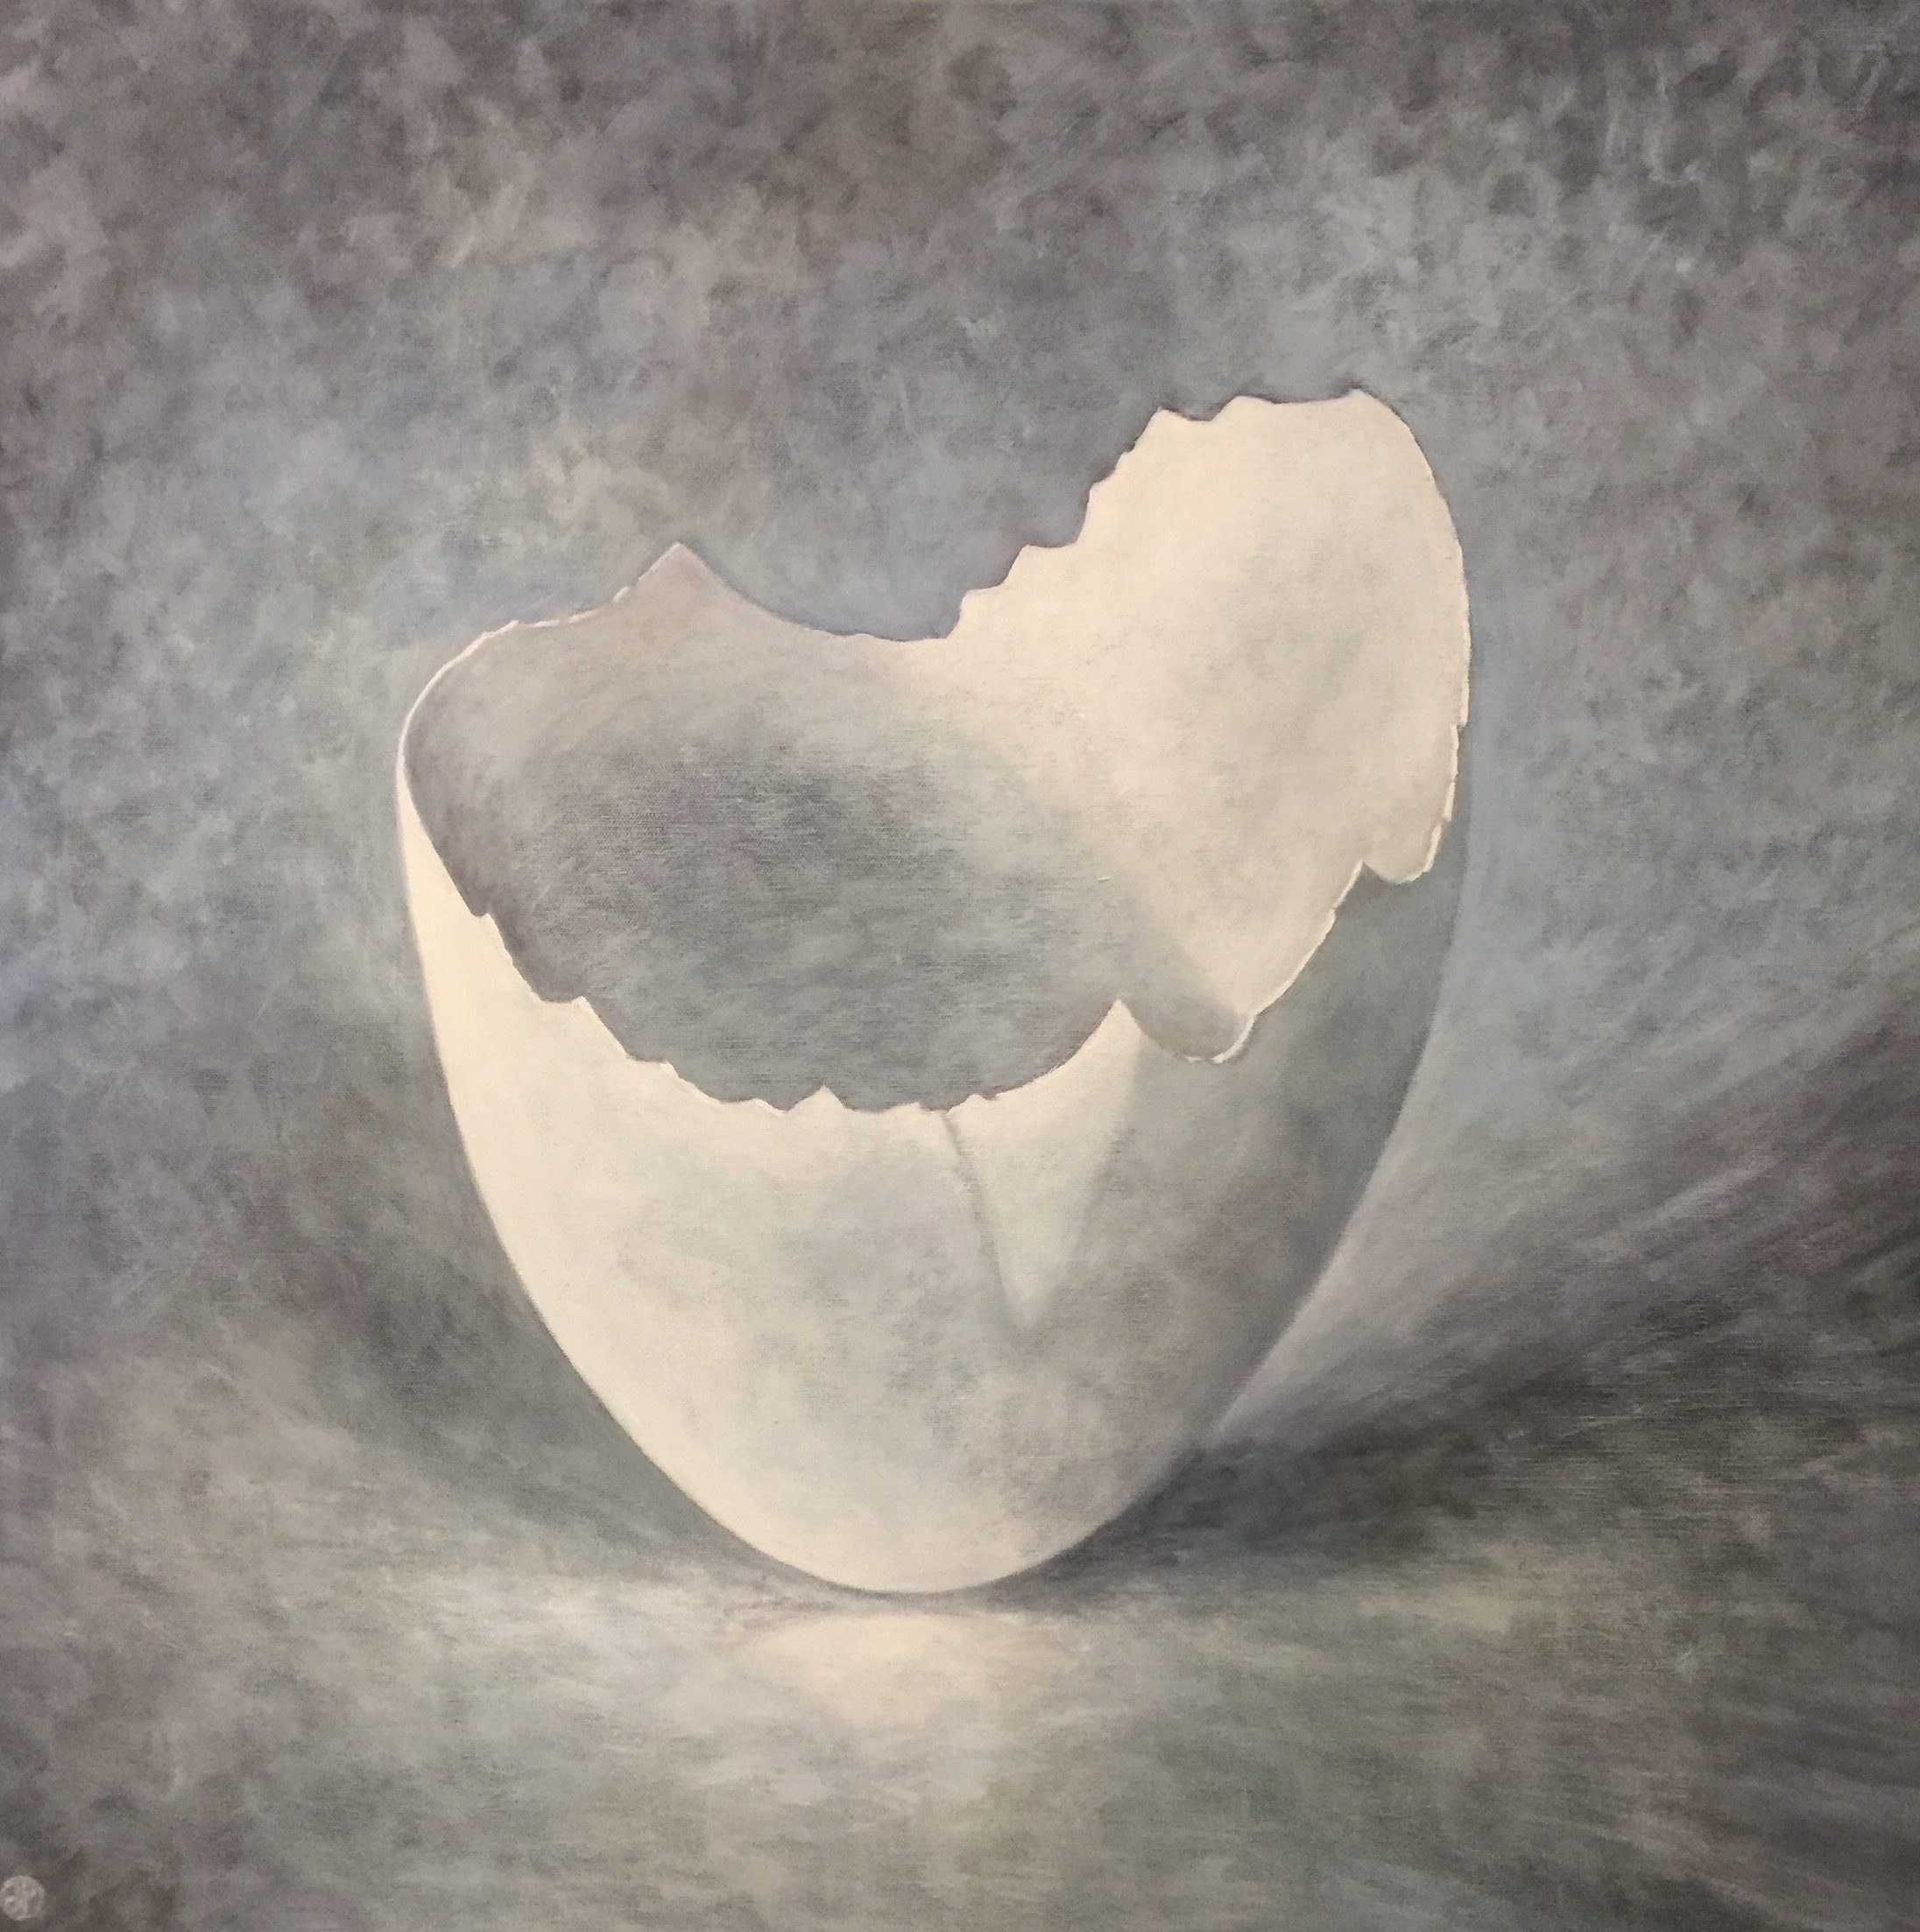 "<span class=""link fancybox-details-link""><a href=""/artists/34-joyce-pinch/works/1817-joyce-pinch-broken-white-egg/"">View Detail Page</a></span><div class=""artist""><strong>Joyce Pinch</strong></div> <div class=""title""><em>Broken White Egg</em></div> <div class=""medium"">Acrylic on Canvas</div> <div class=""dimensions"">77 x 77 cm</div><div class=""copyright_line"">Copyright The Artist</div>"